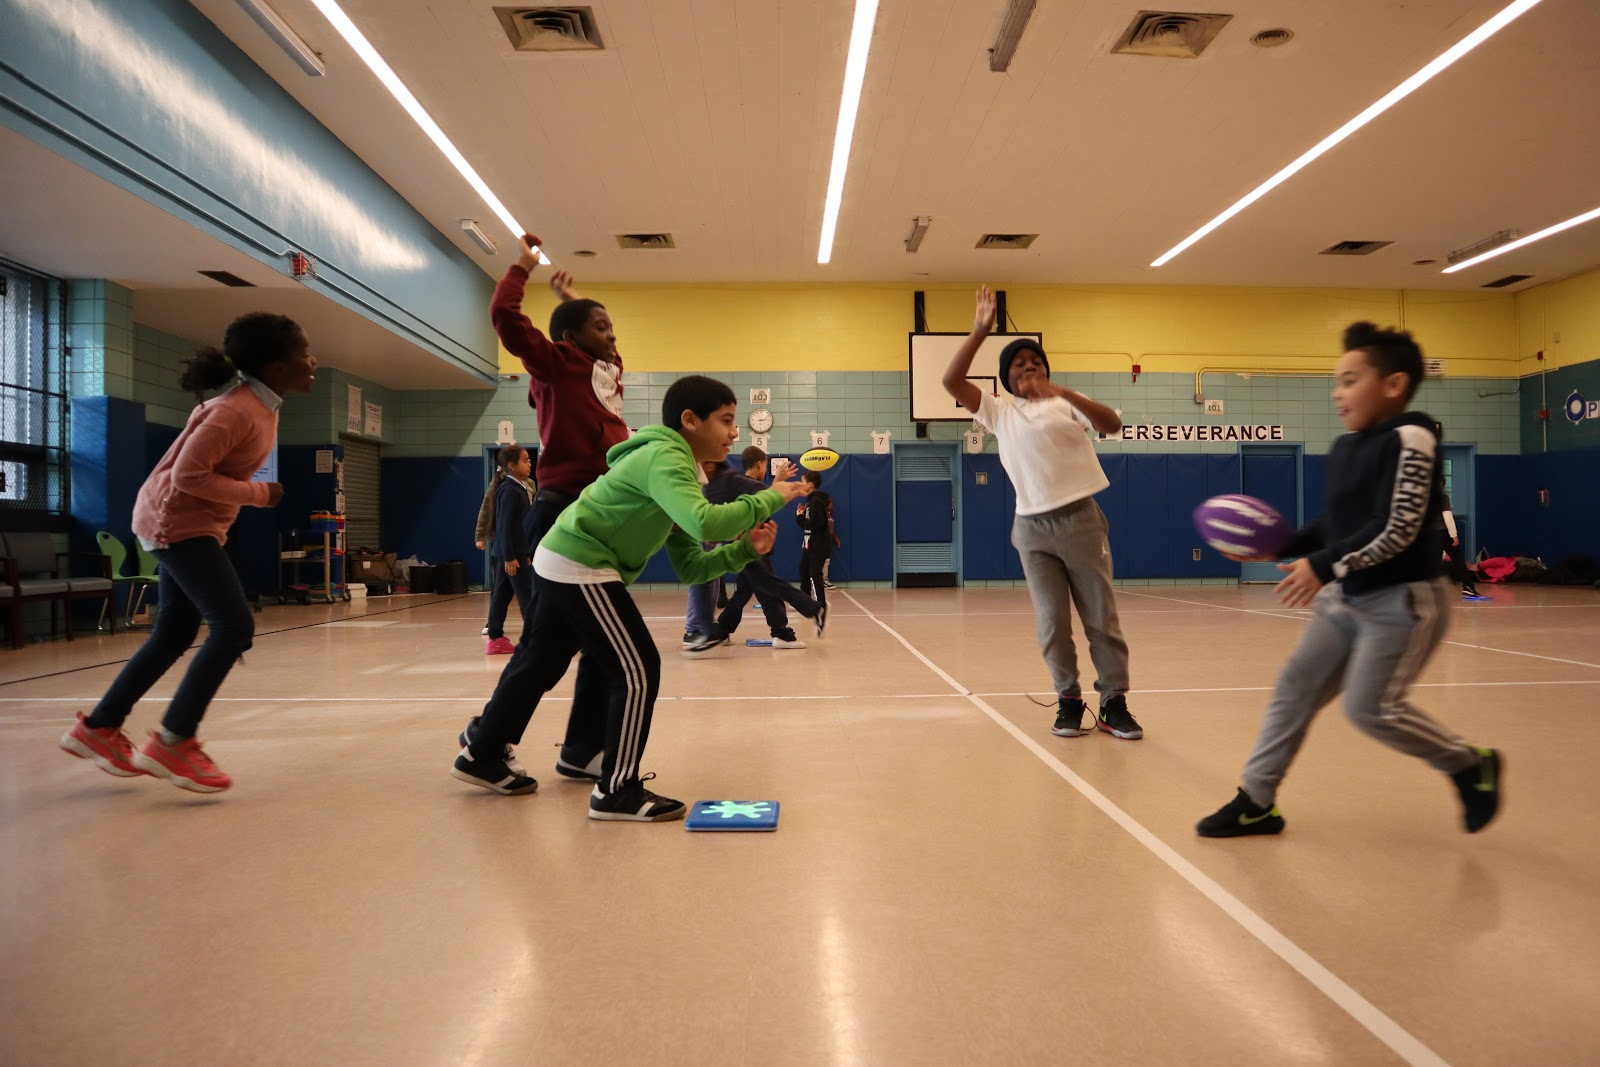 football drills using STEM programs in elementary schools